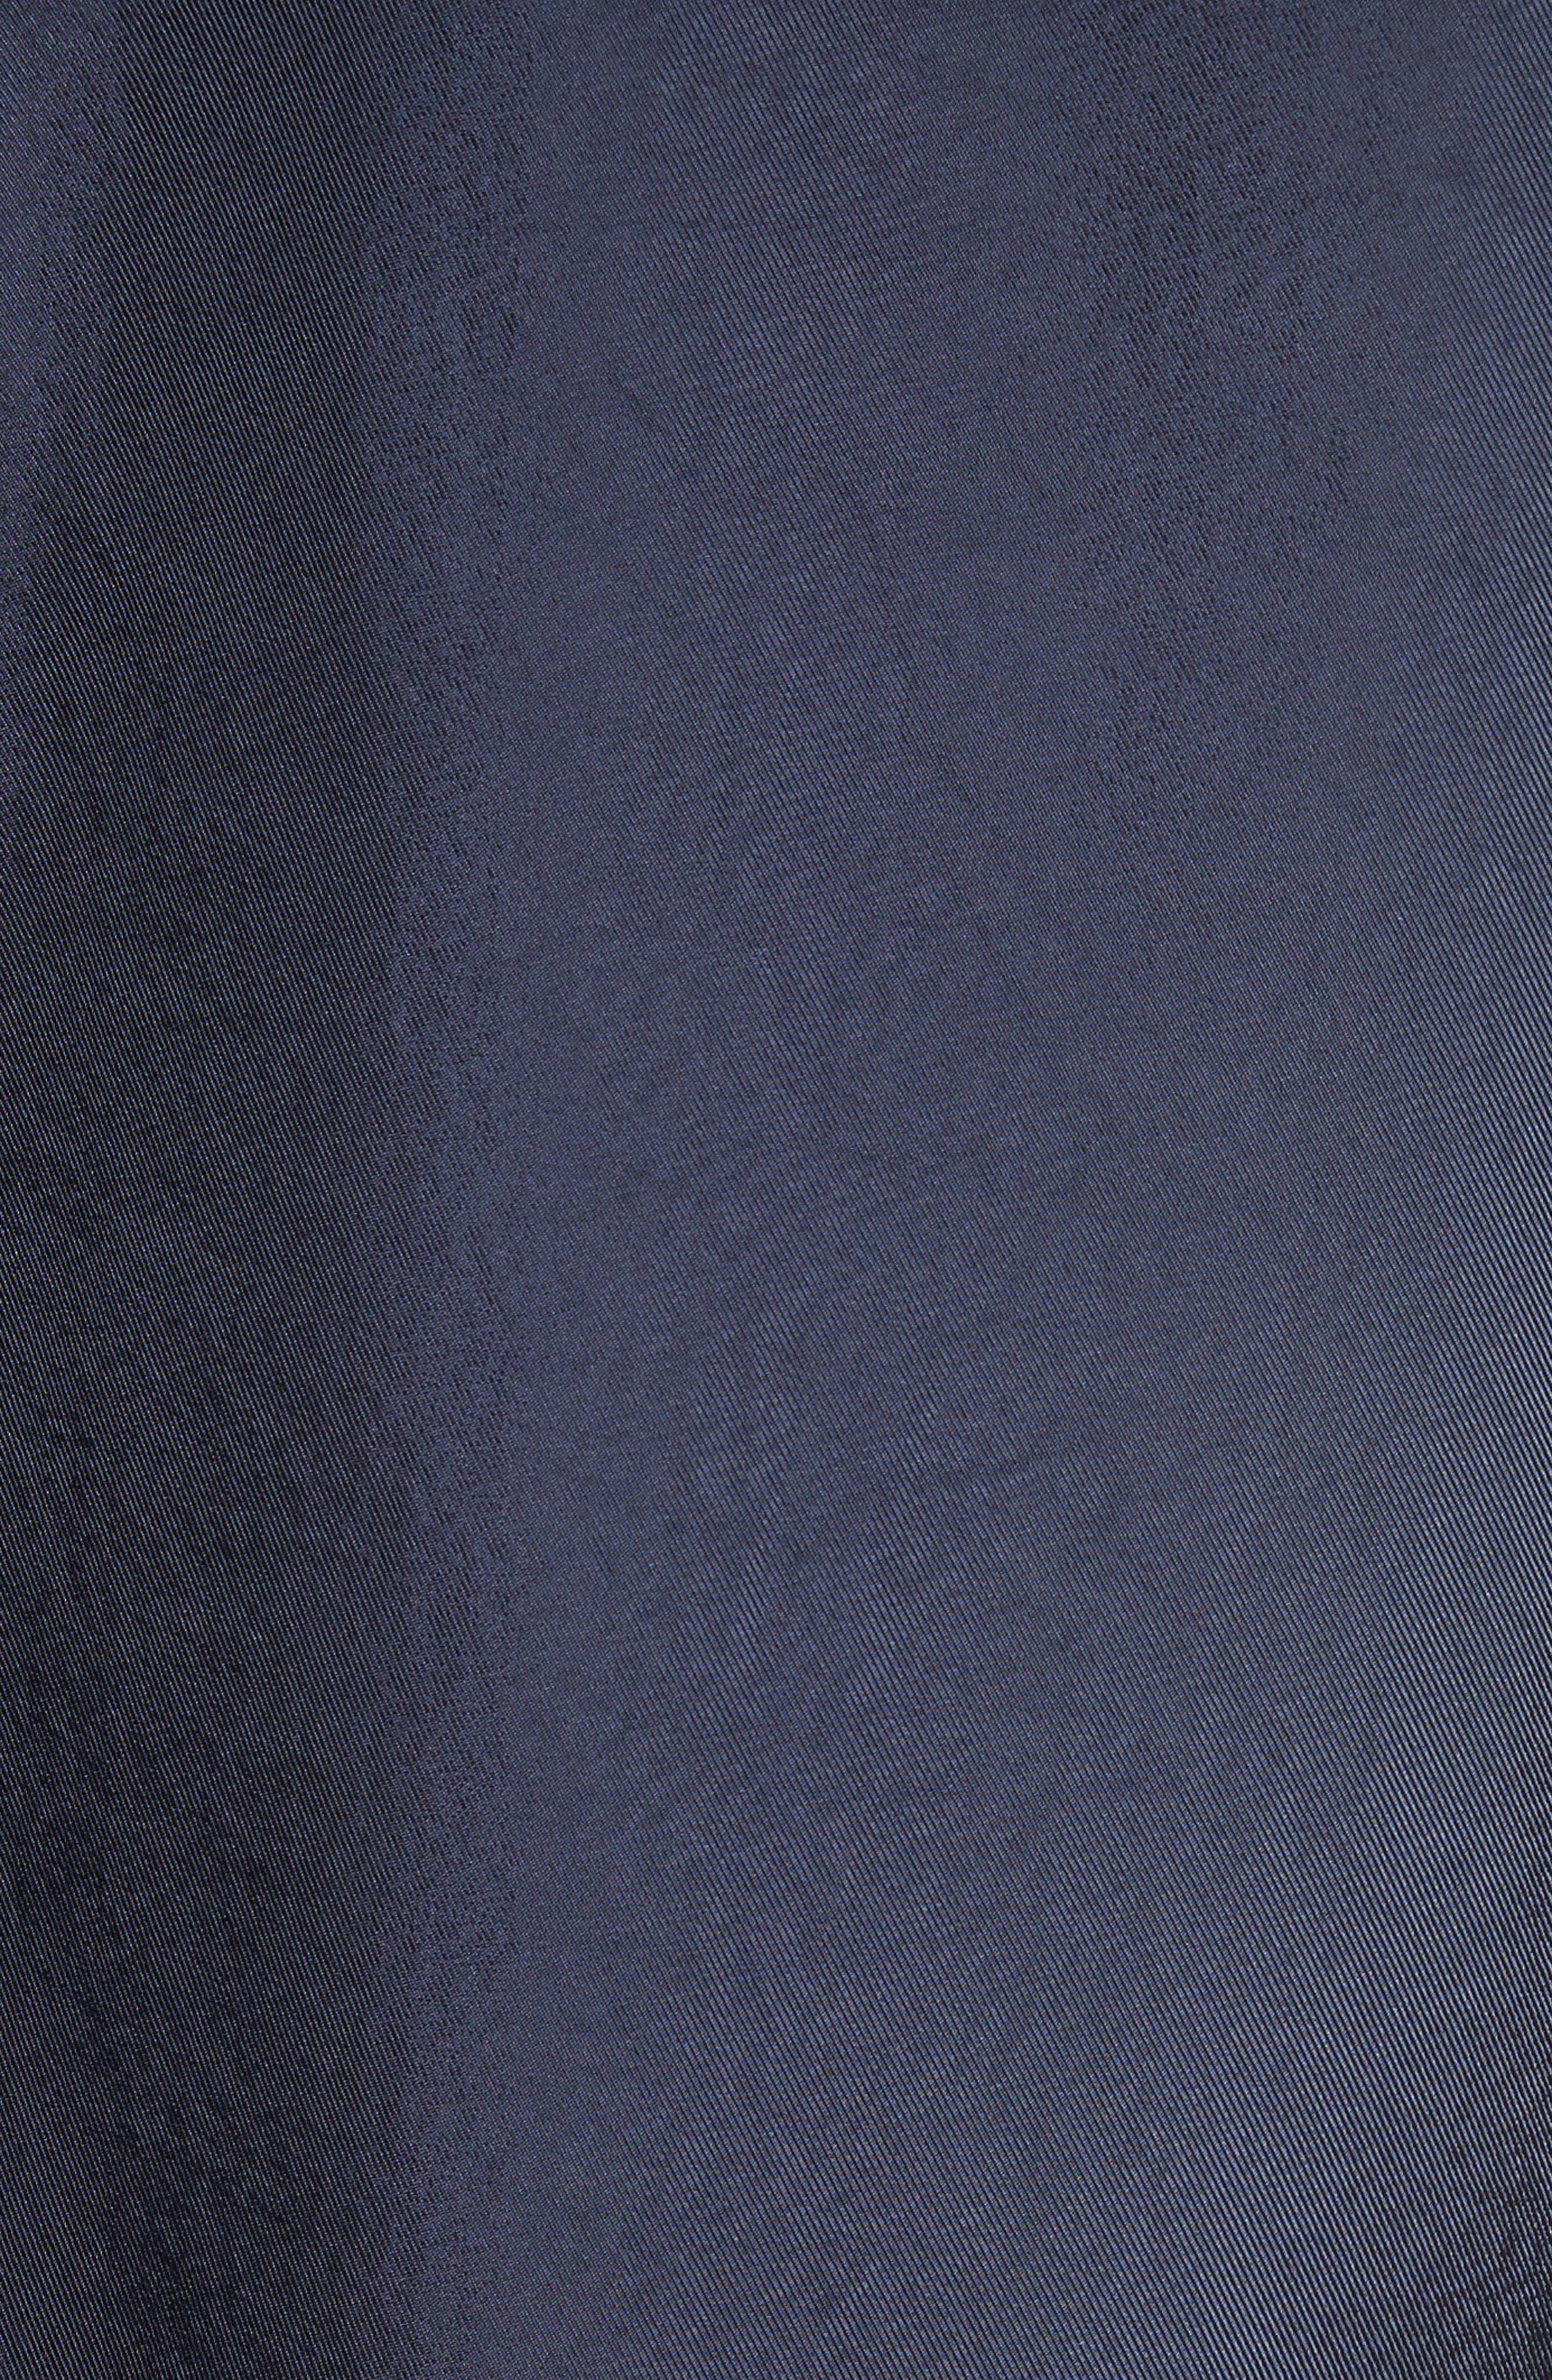 Hooded Jacket,                             Alternate thumbnail 5, color,                             Navy Multi